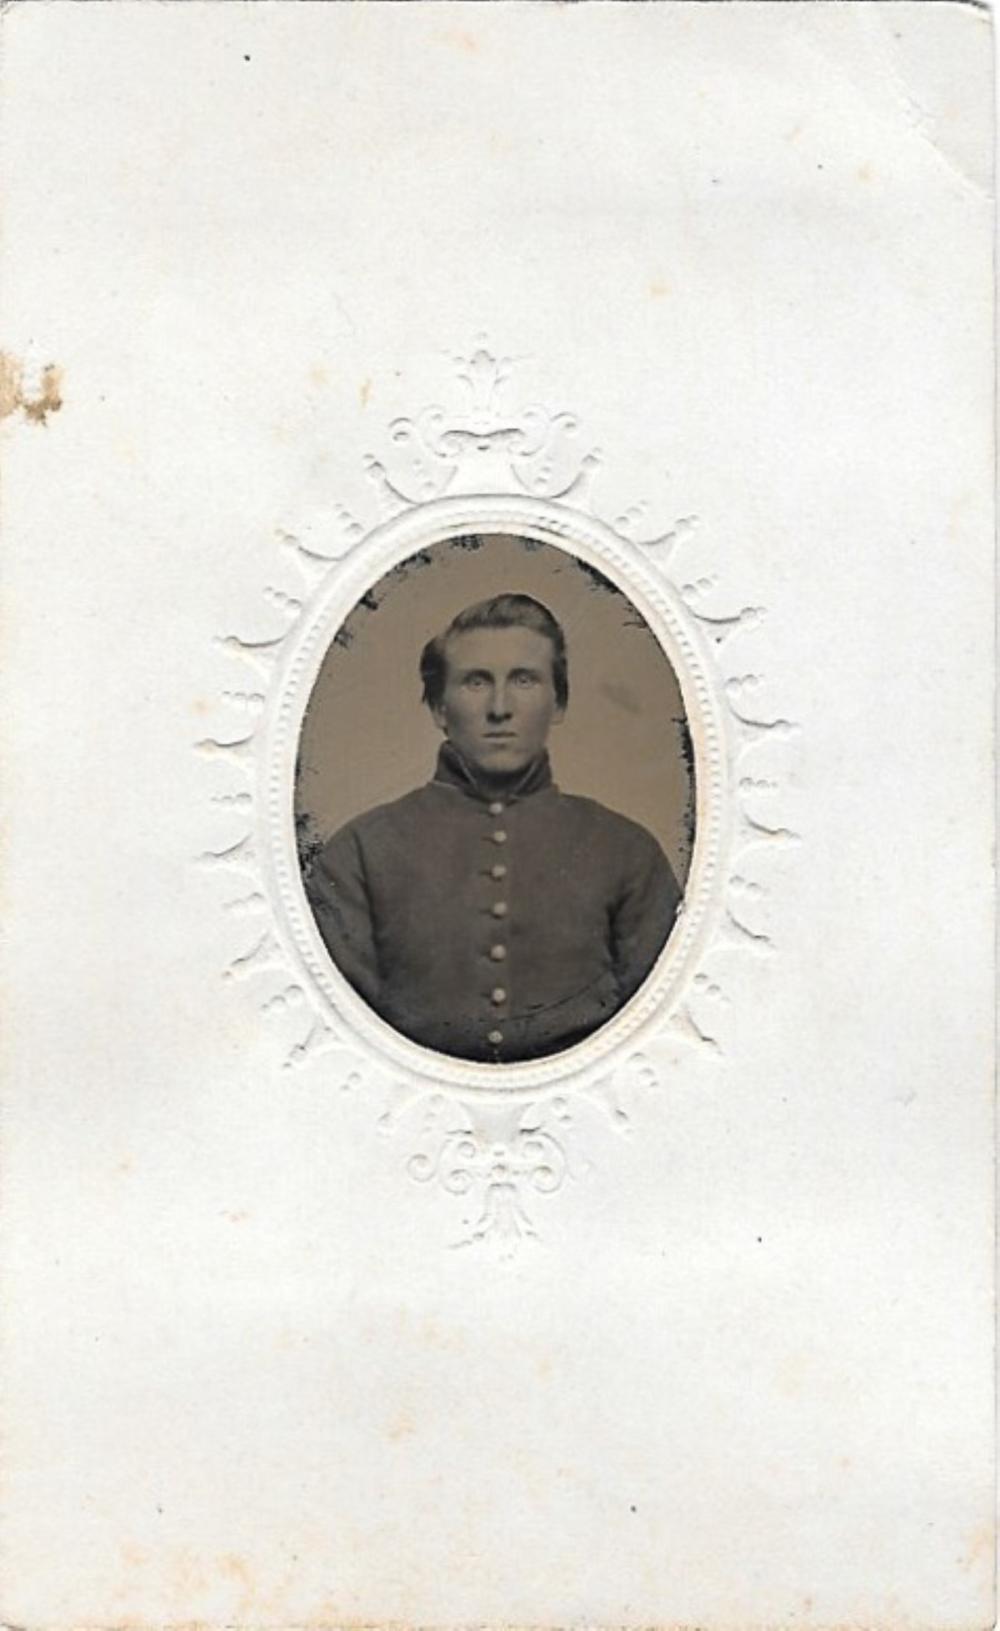 Civil War soldier tintype photograph